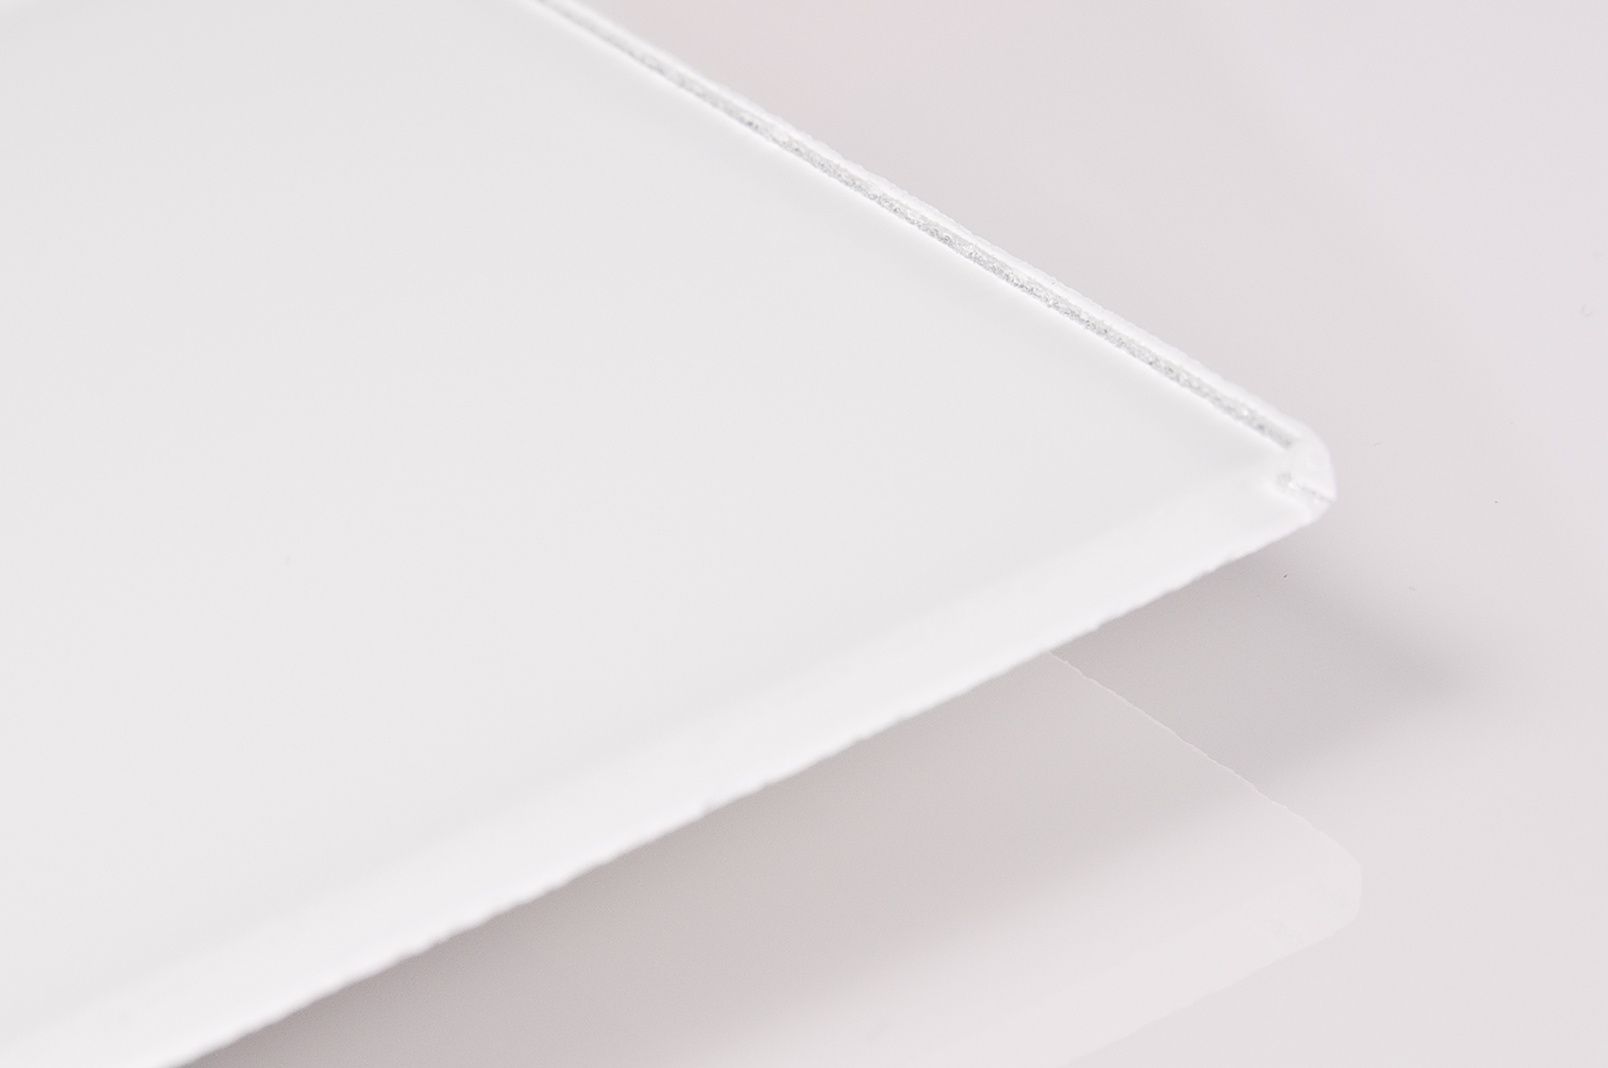 k chenr ckwand aus glas lacobel farbig max glas. Black Bedroom Furniture Sets. Home Design Ideas